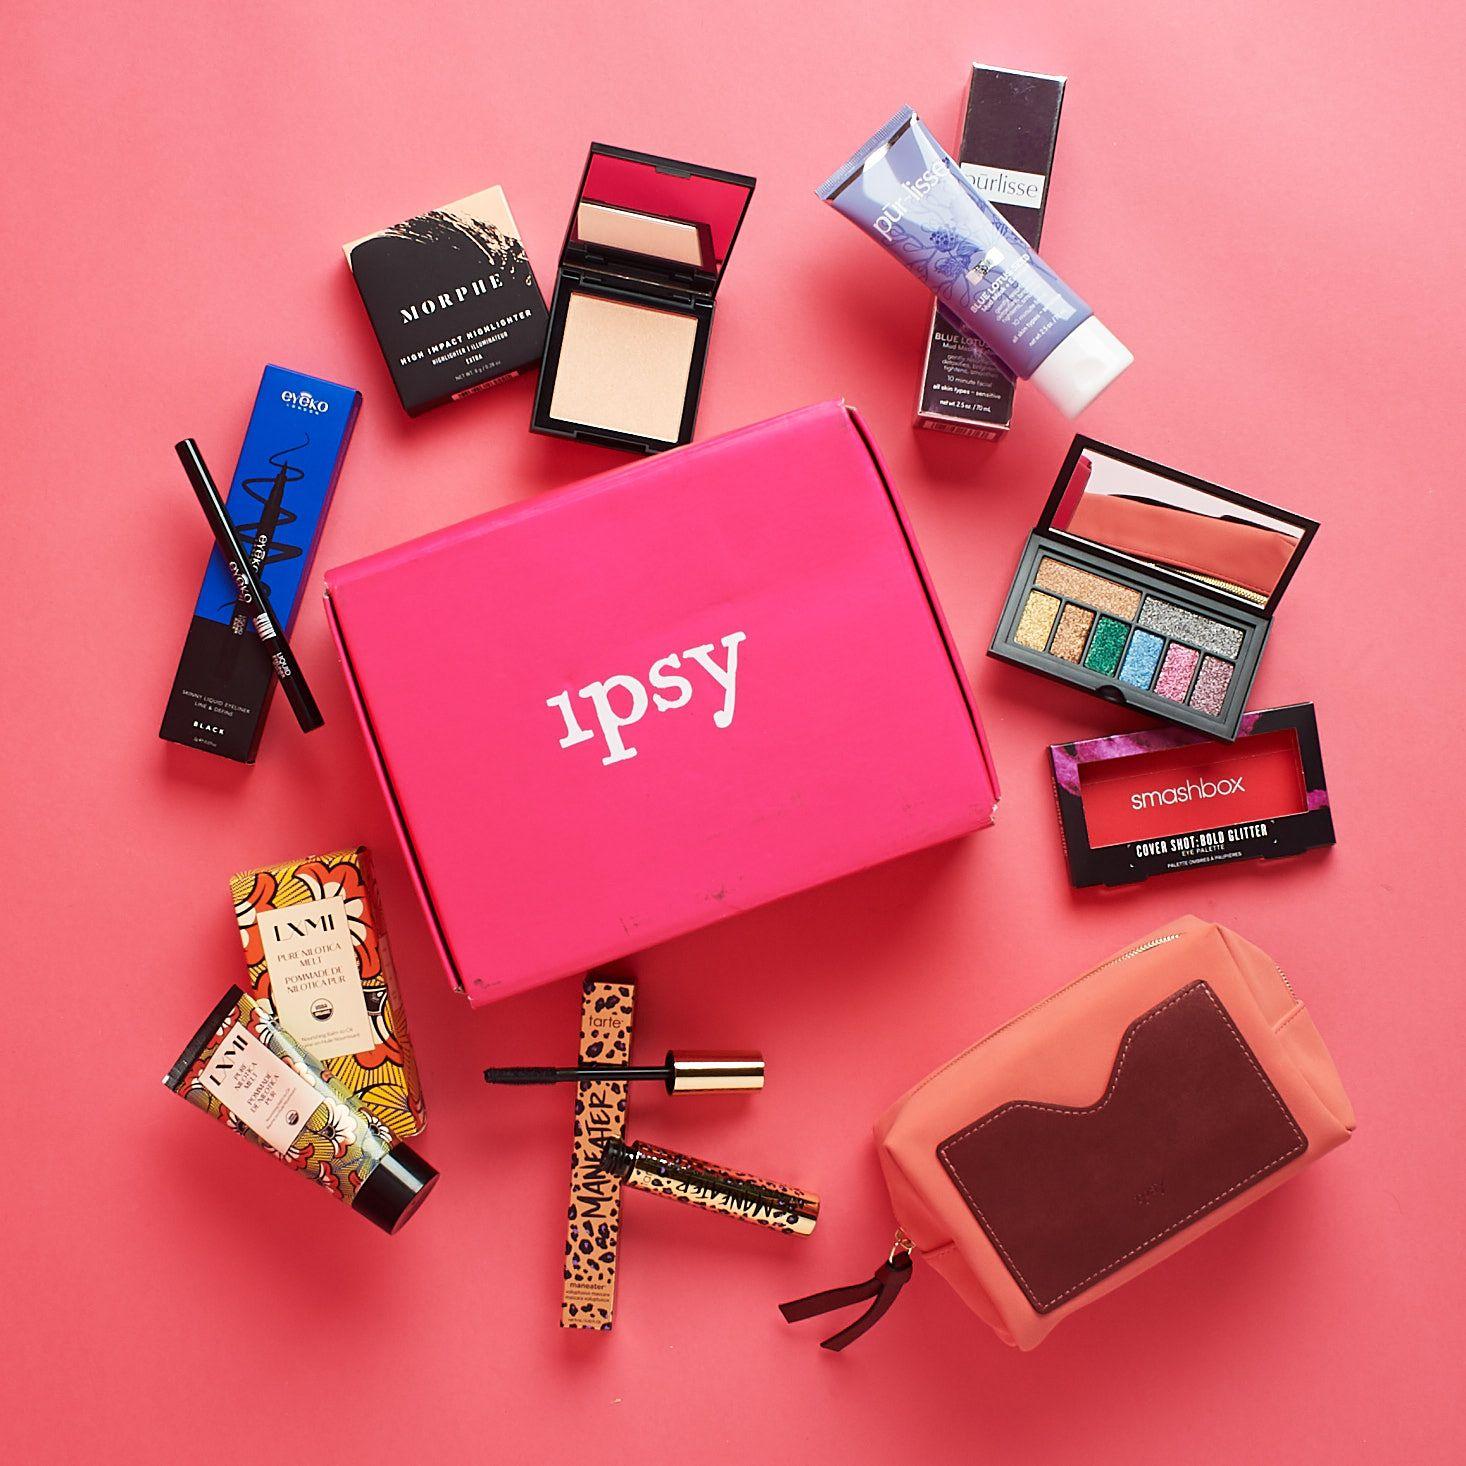 Ipsy Glam Bag Plus Ipsy glam bag, Makeup box, Halloween